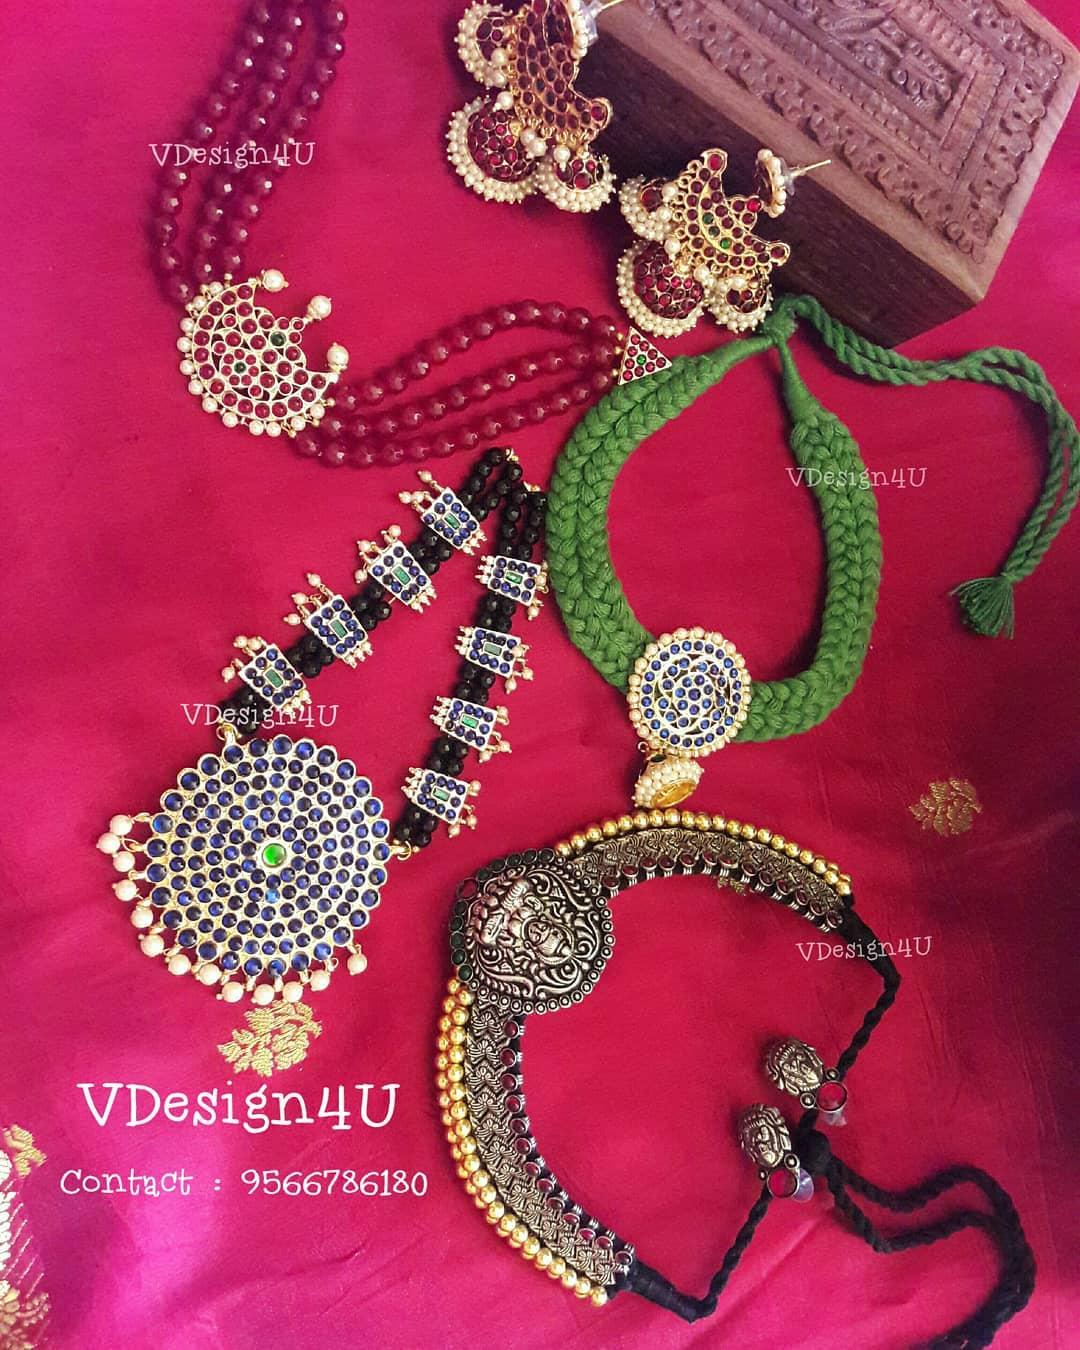 kemp-jewellery-designs-2019 (10)